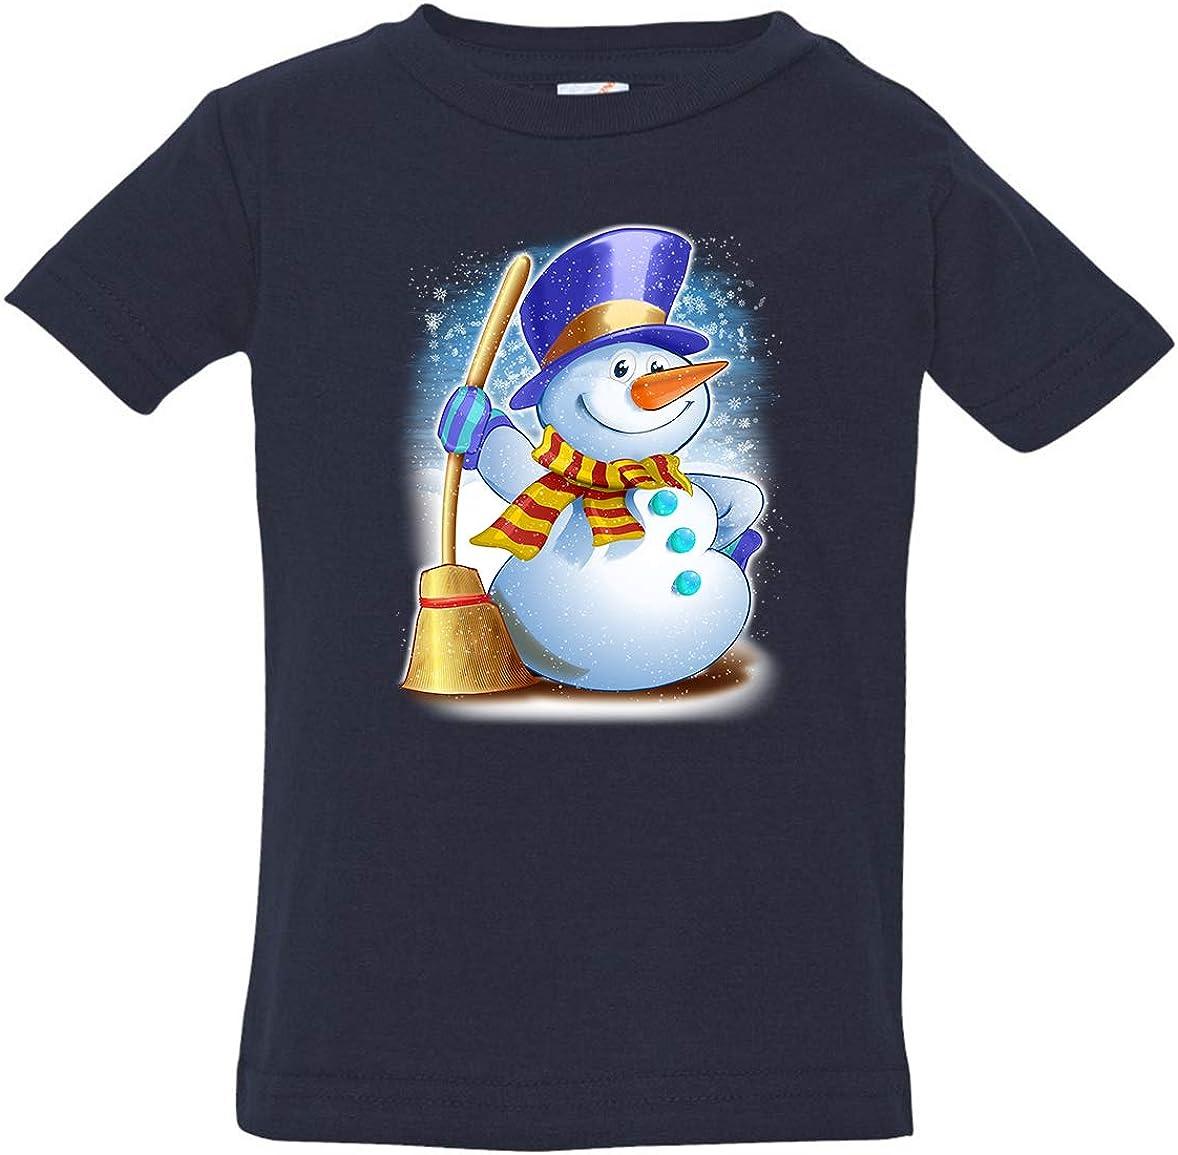 Tenacitee Babys Happy Snowman Shirt